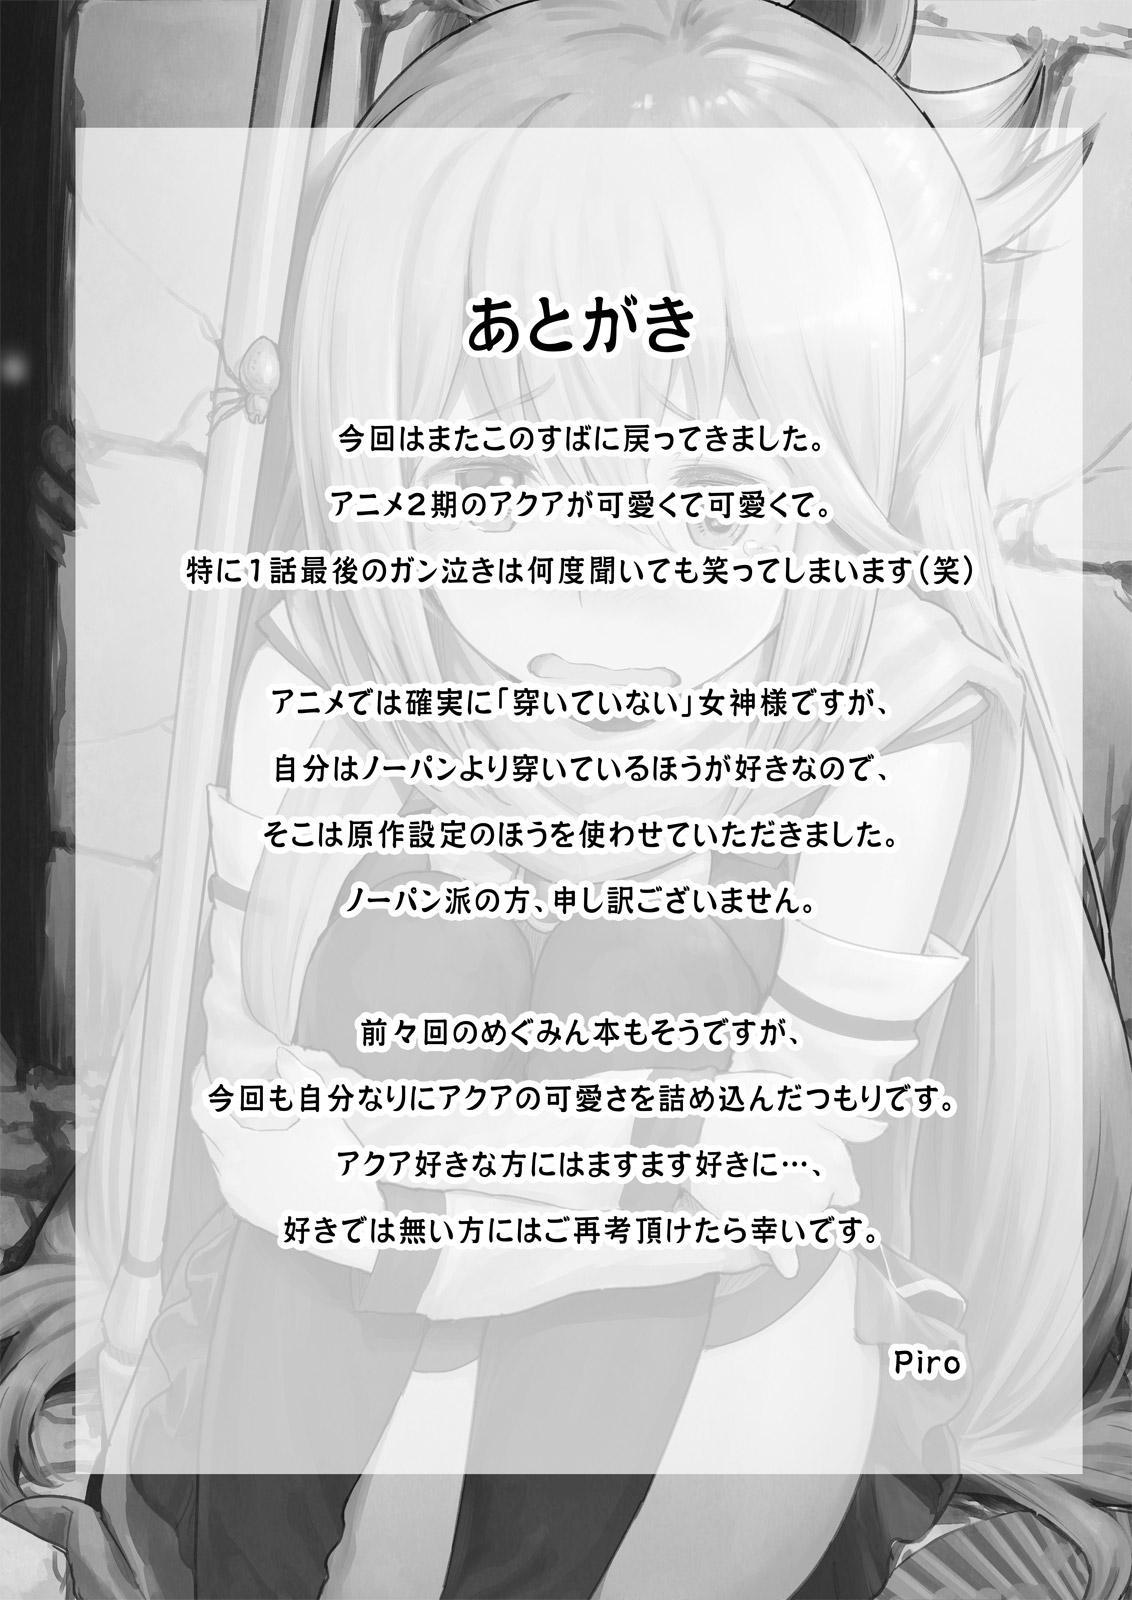 Damegami-sama wa Nomisugi ni Gochuui o! 25